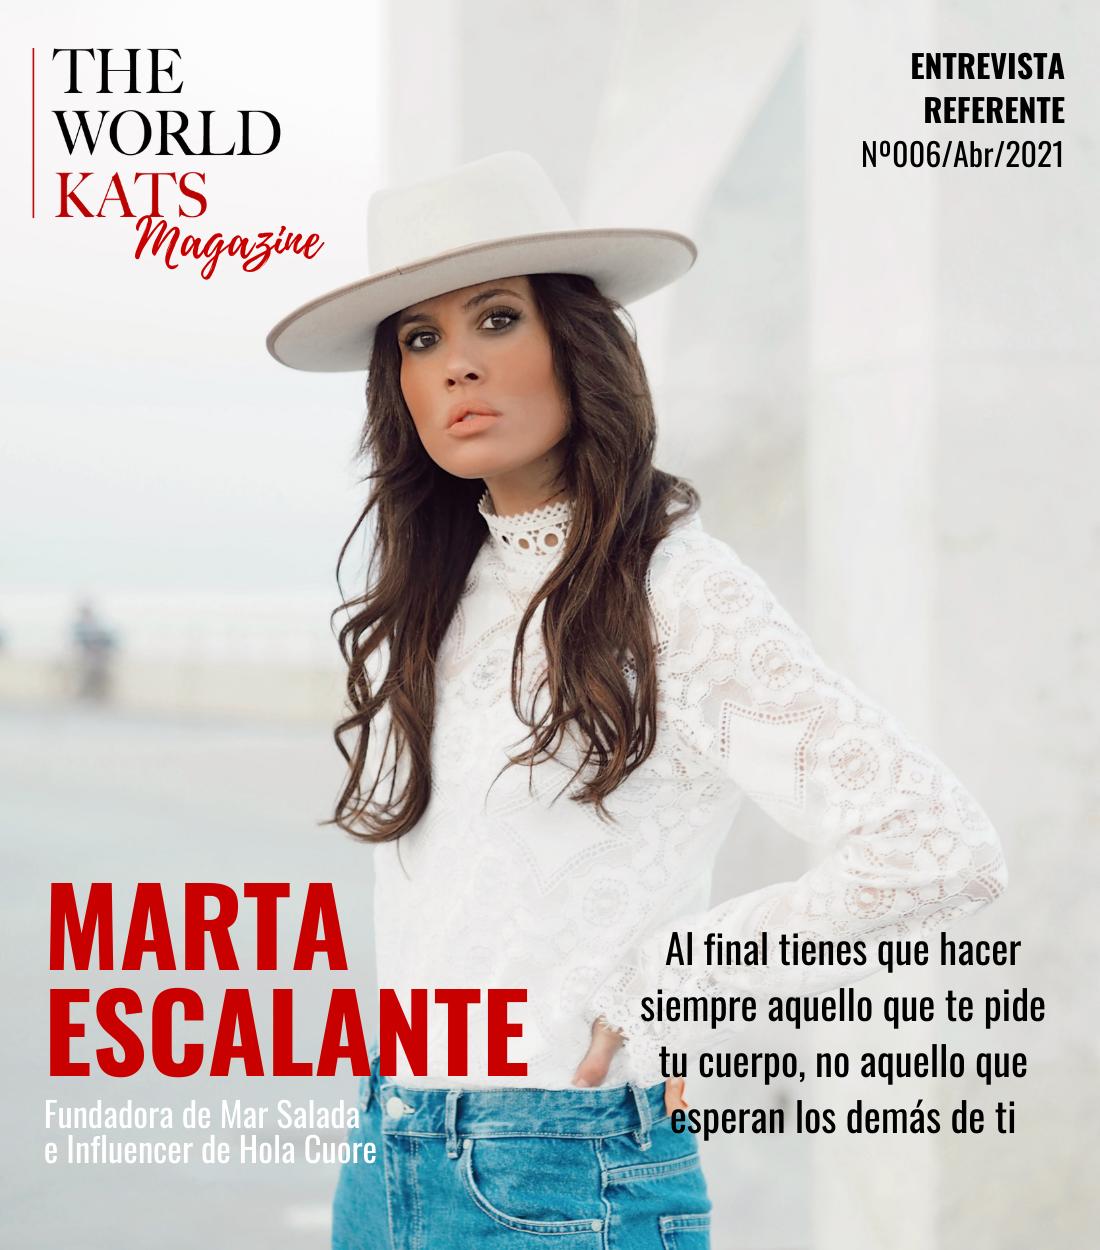 Entrevista a Marta Escalante fundadora de Hola Cuore